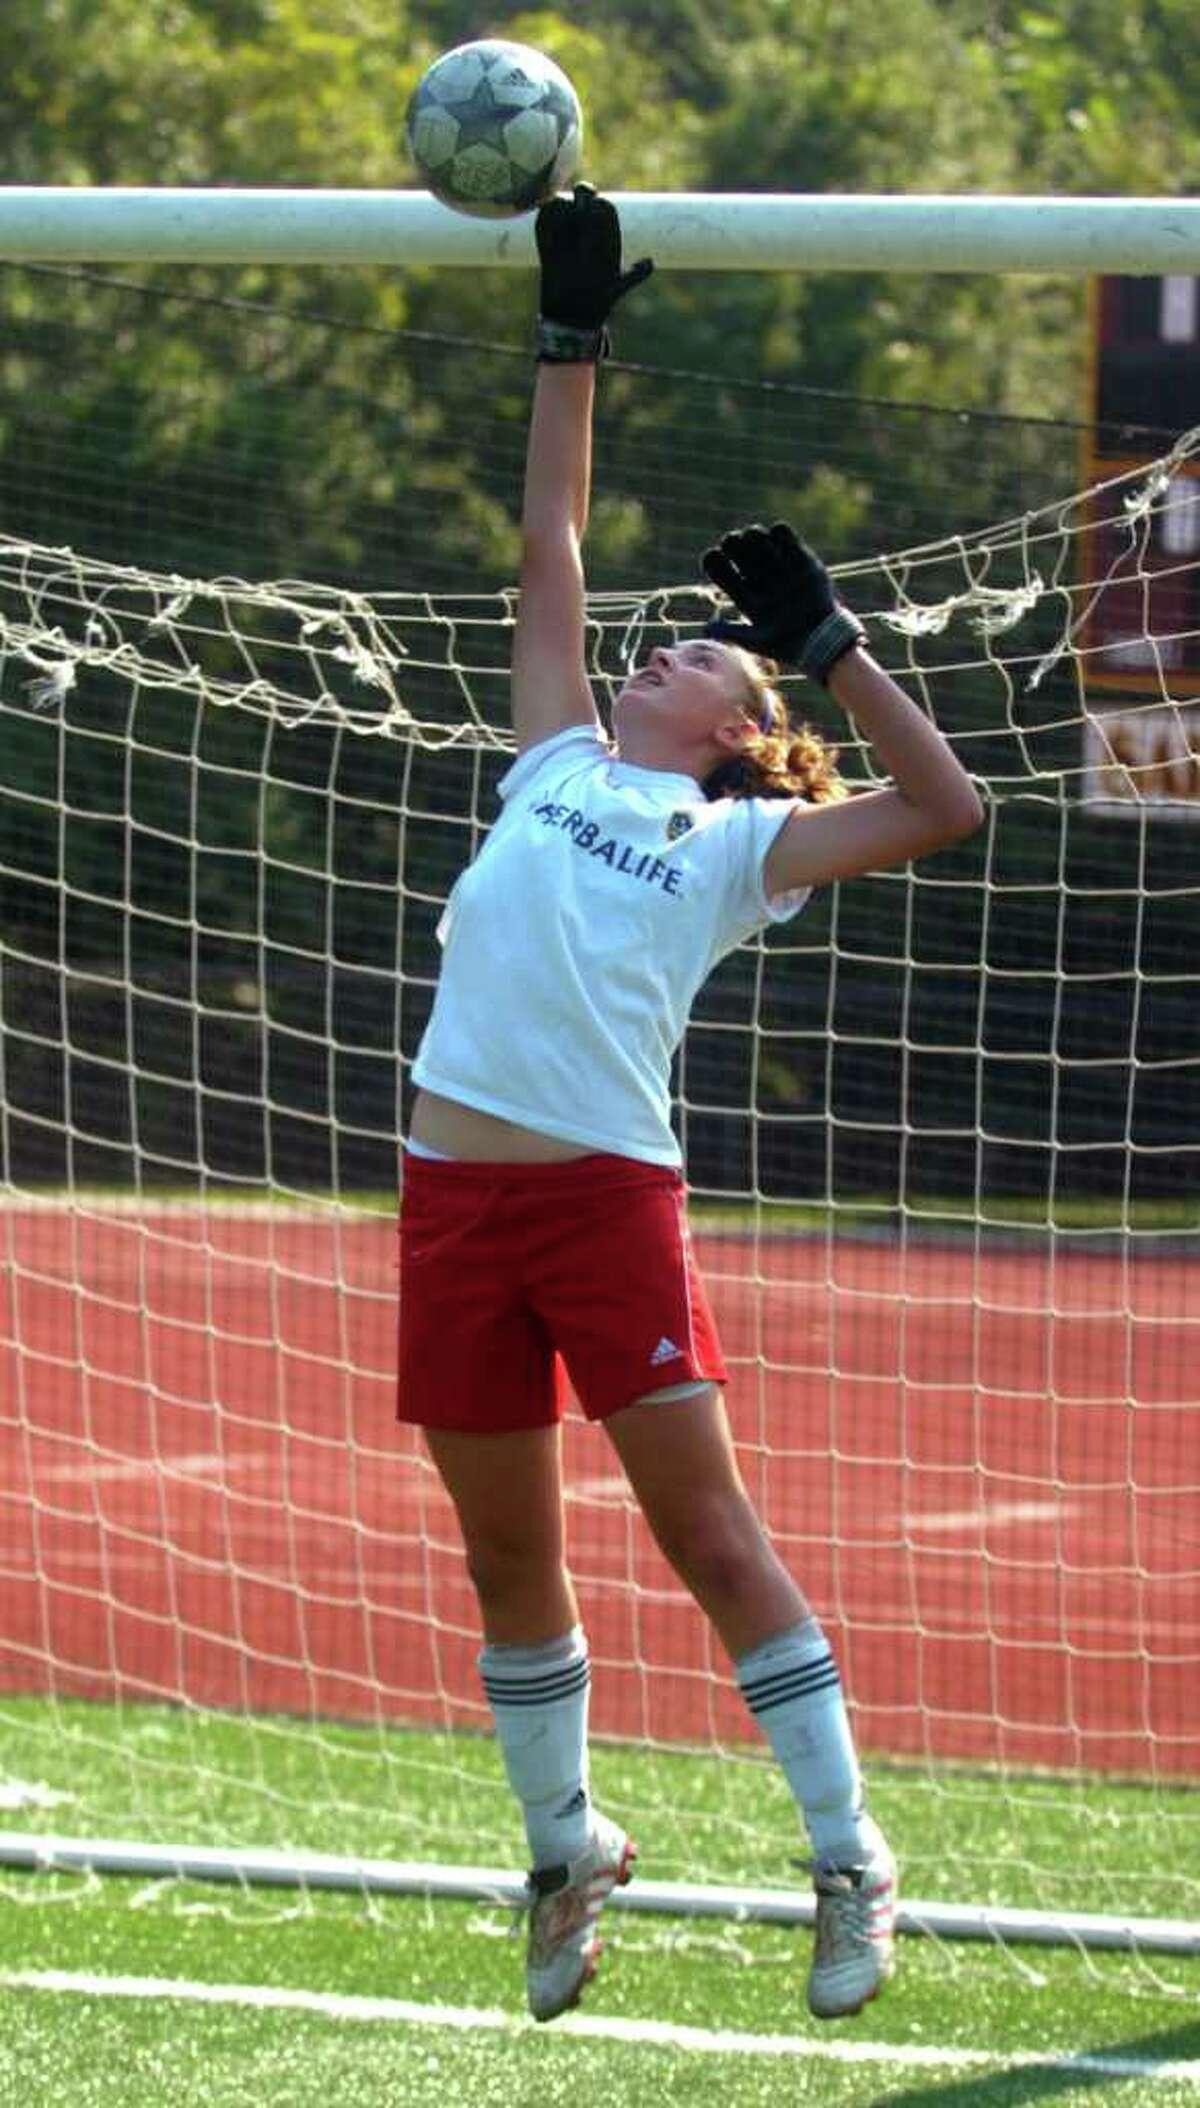 St. Joseph's Molly Meehan practices on the school's field Thursday, September 2, 2010.